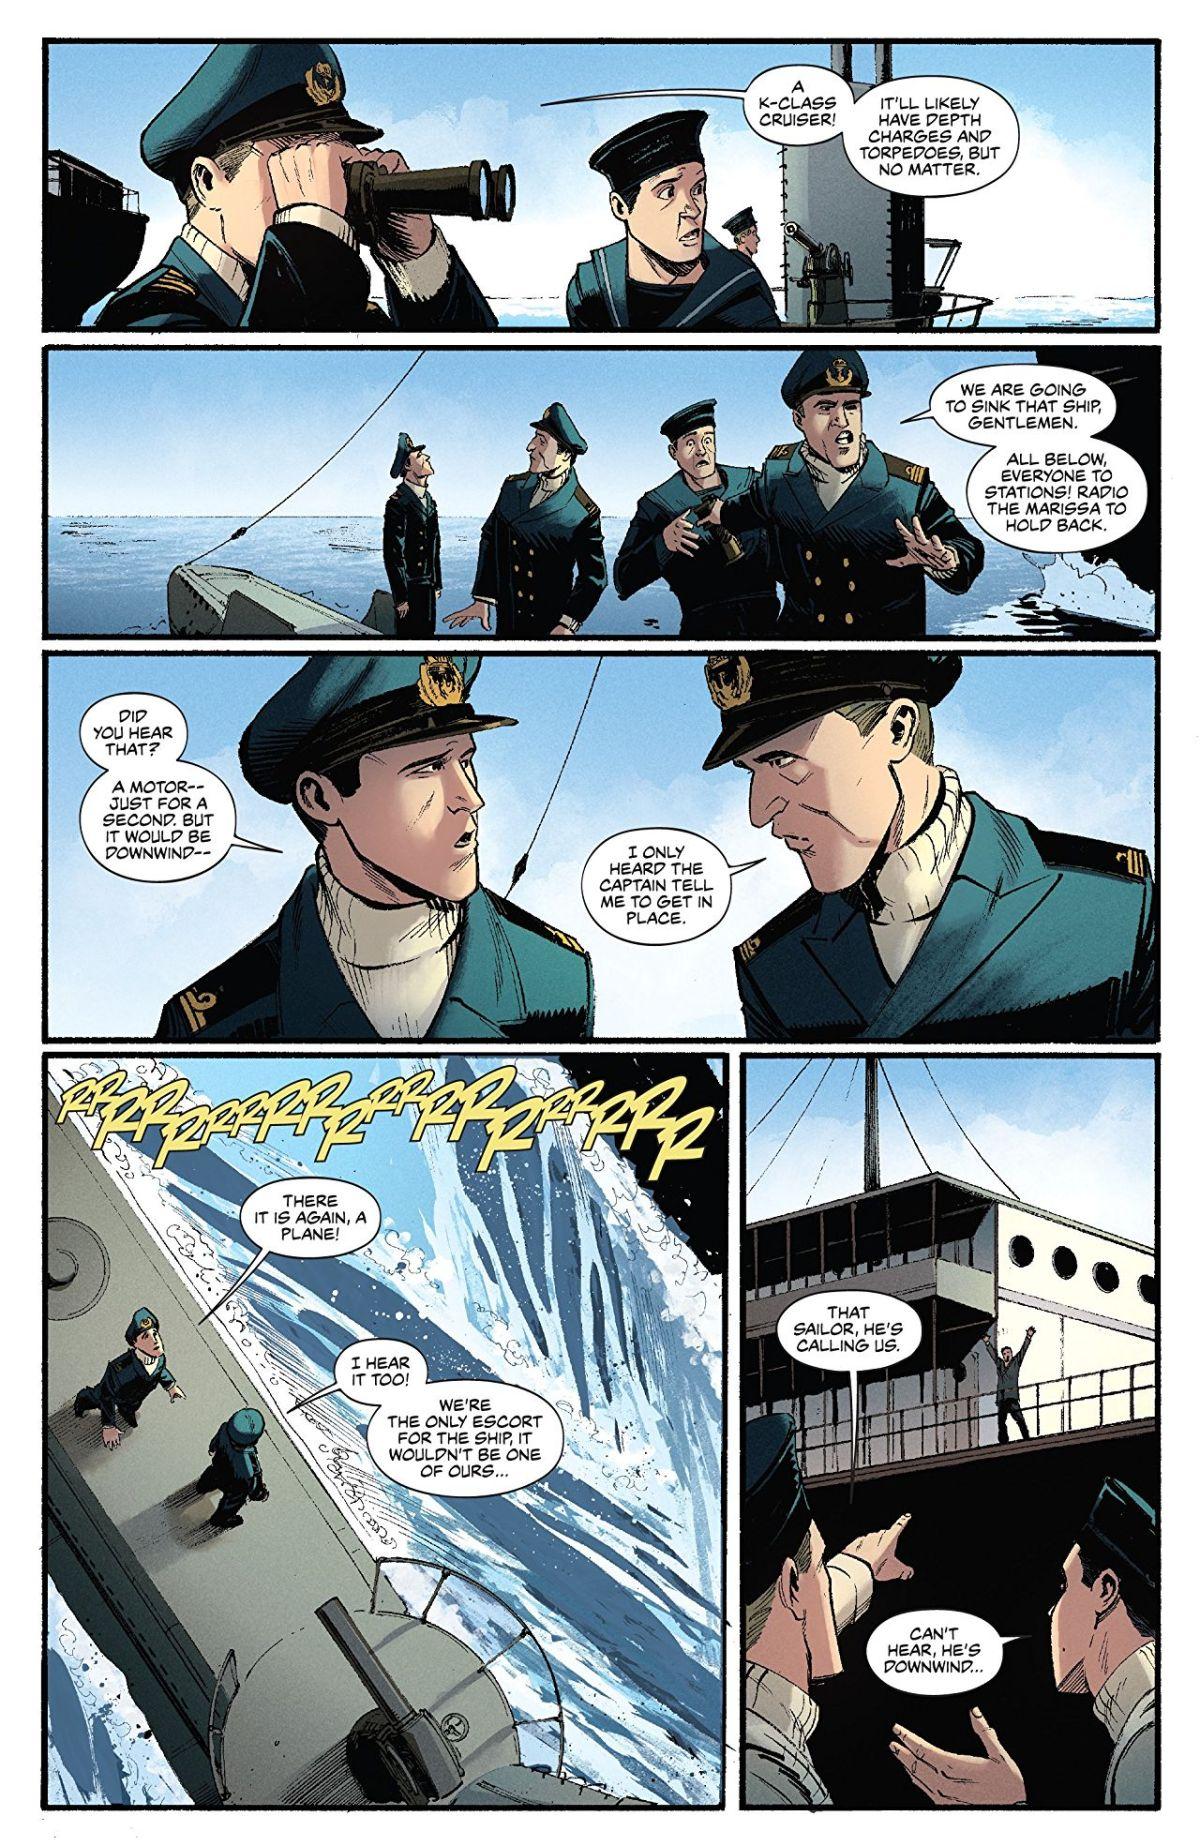 James Bond Origin Overview Of A Notable Spy Thriller Comics 7